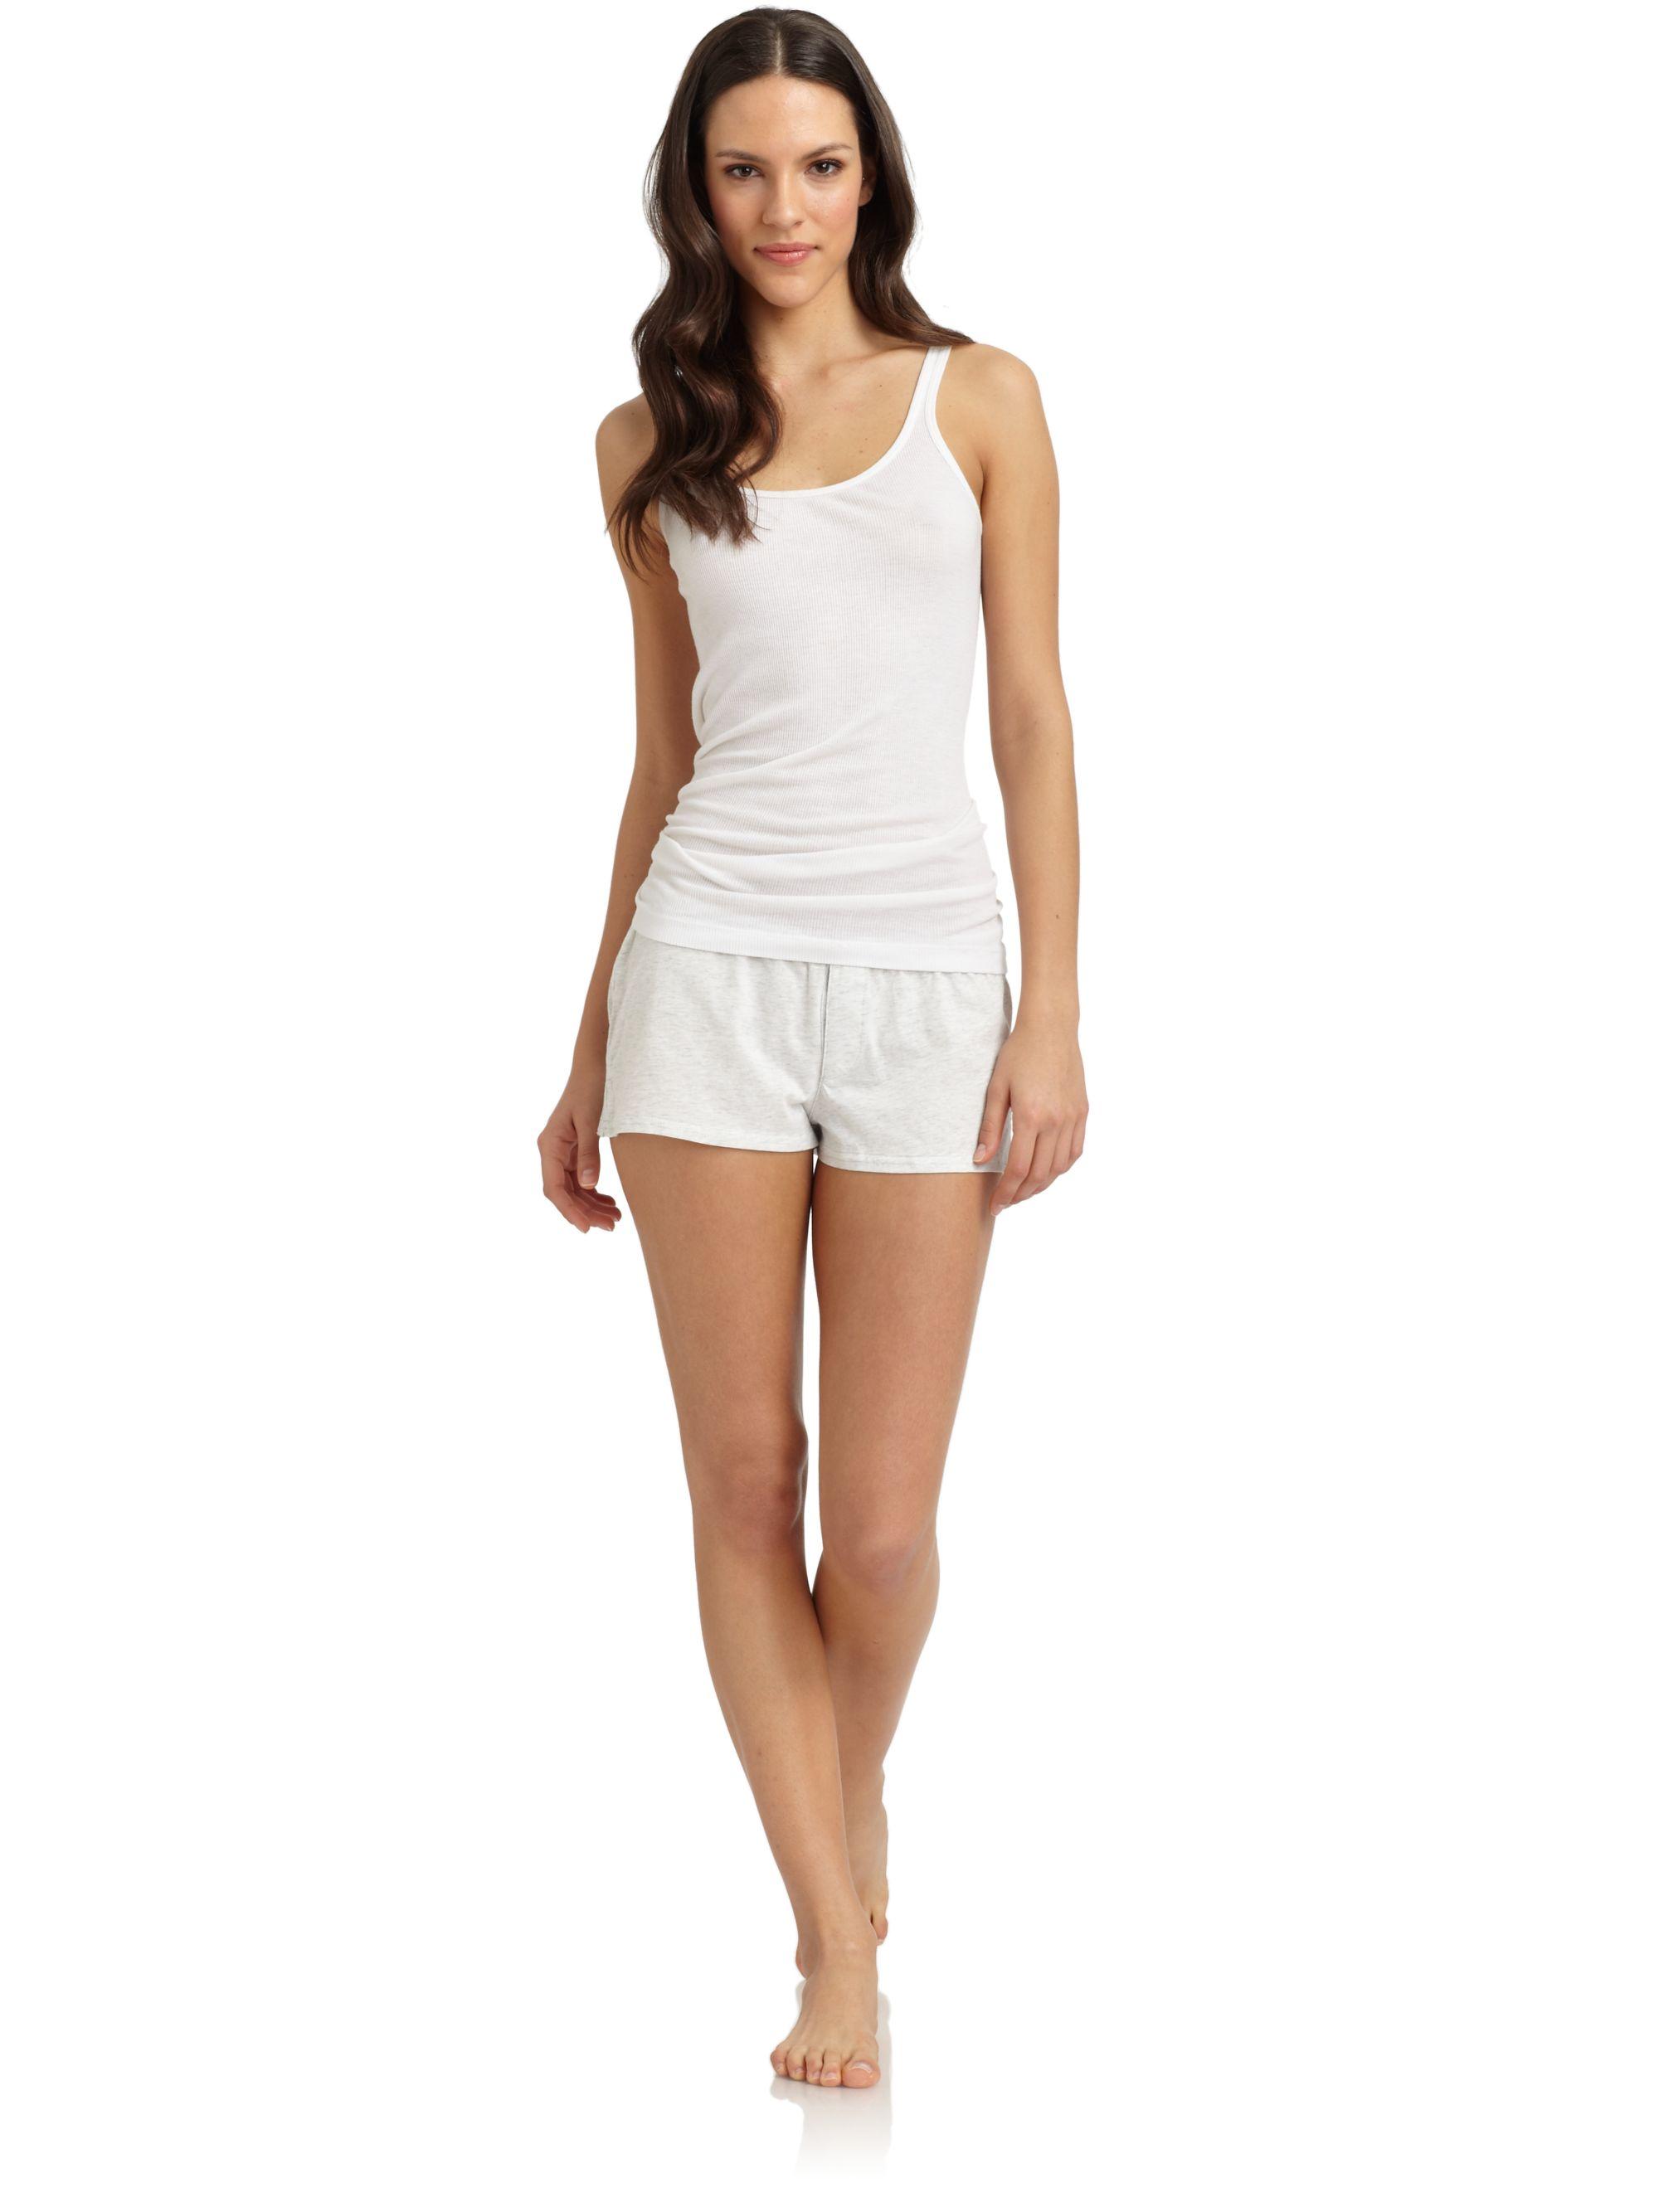 Donna karan new york pajama shorts in white grey lyst for Donna karan new york